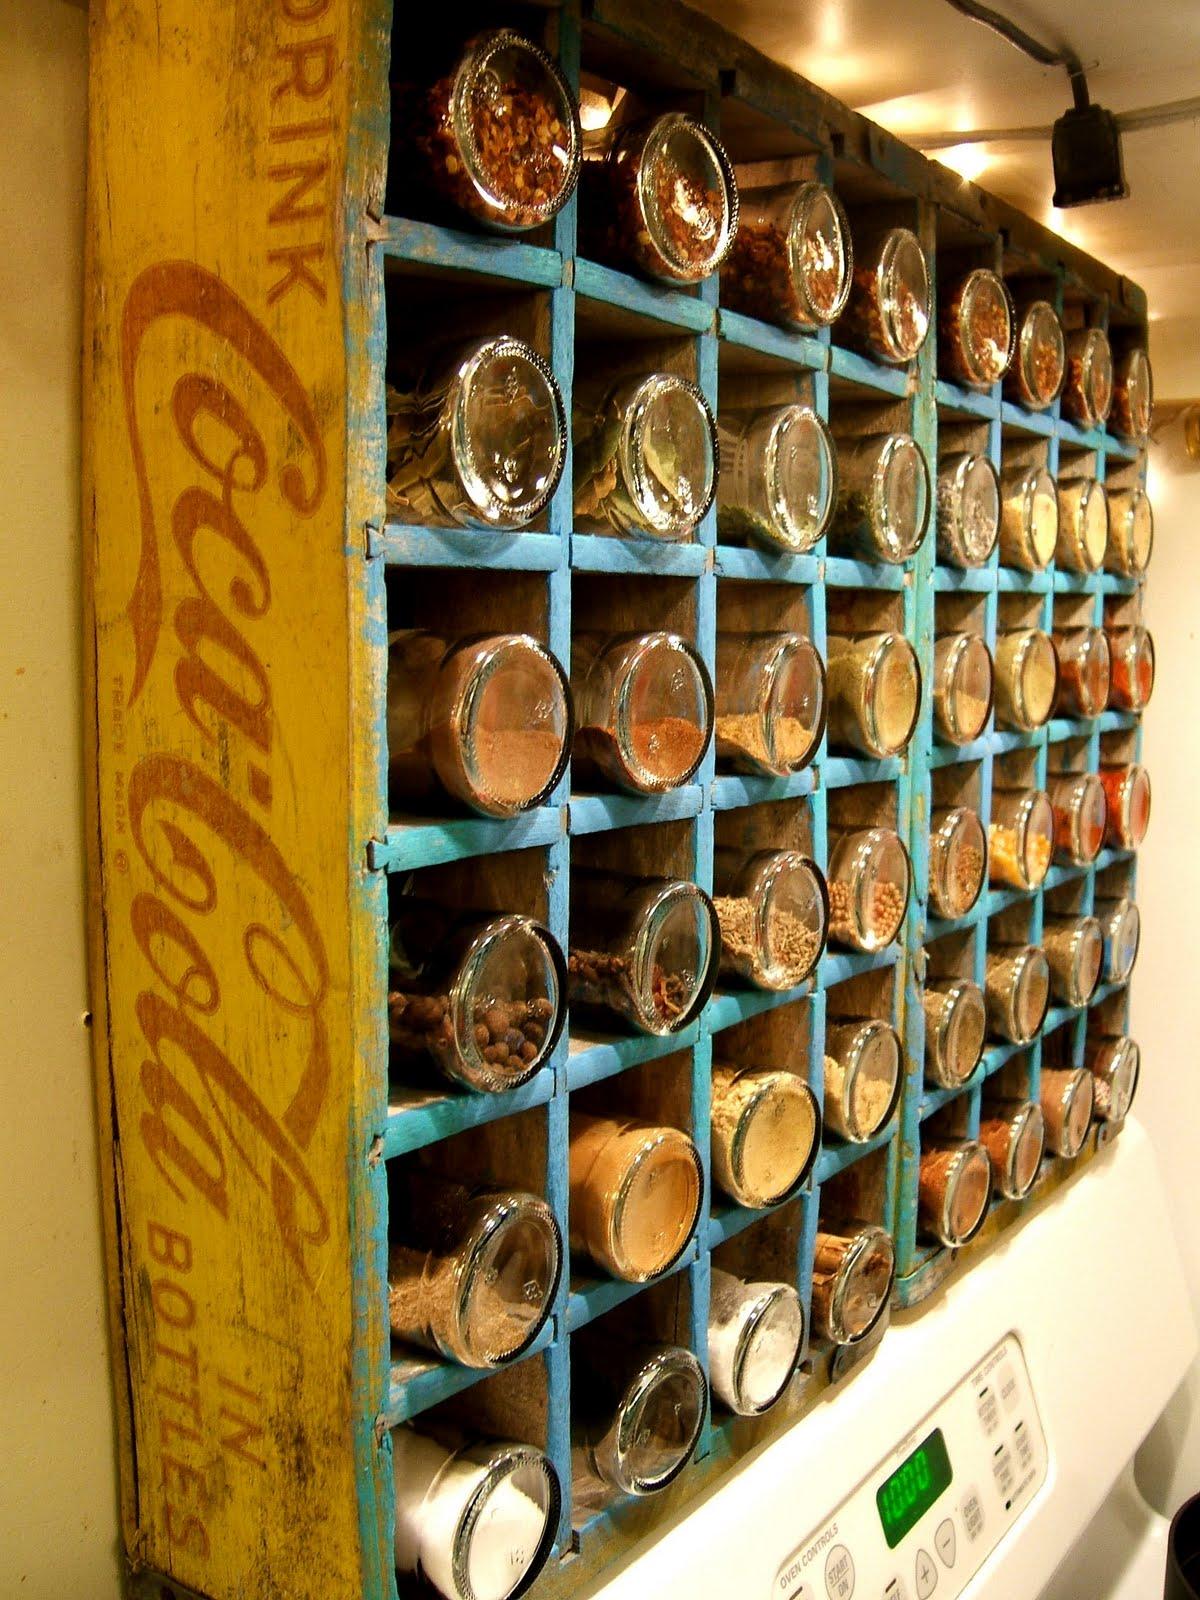 Coke Bottle Spice Rack from Nine Red